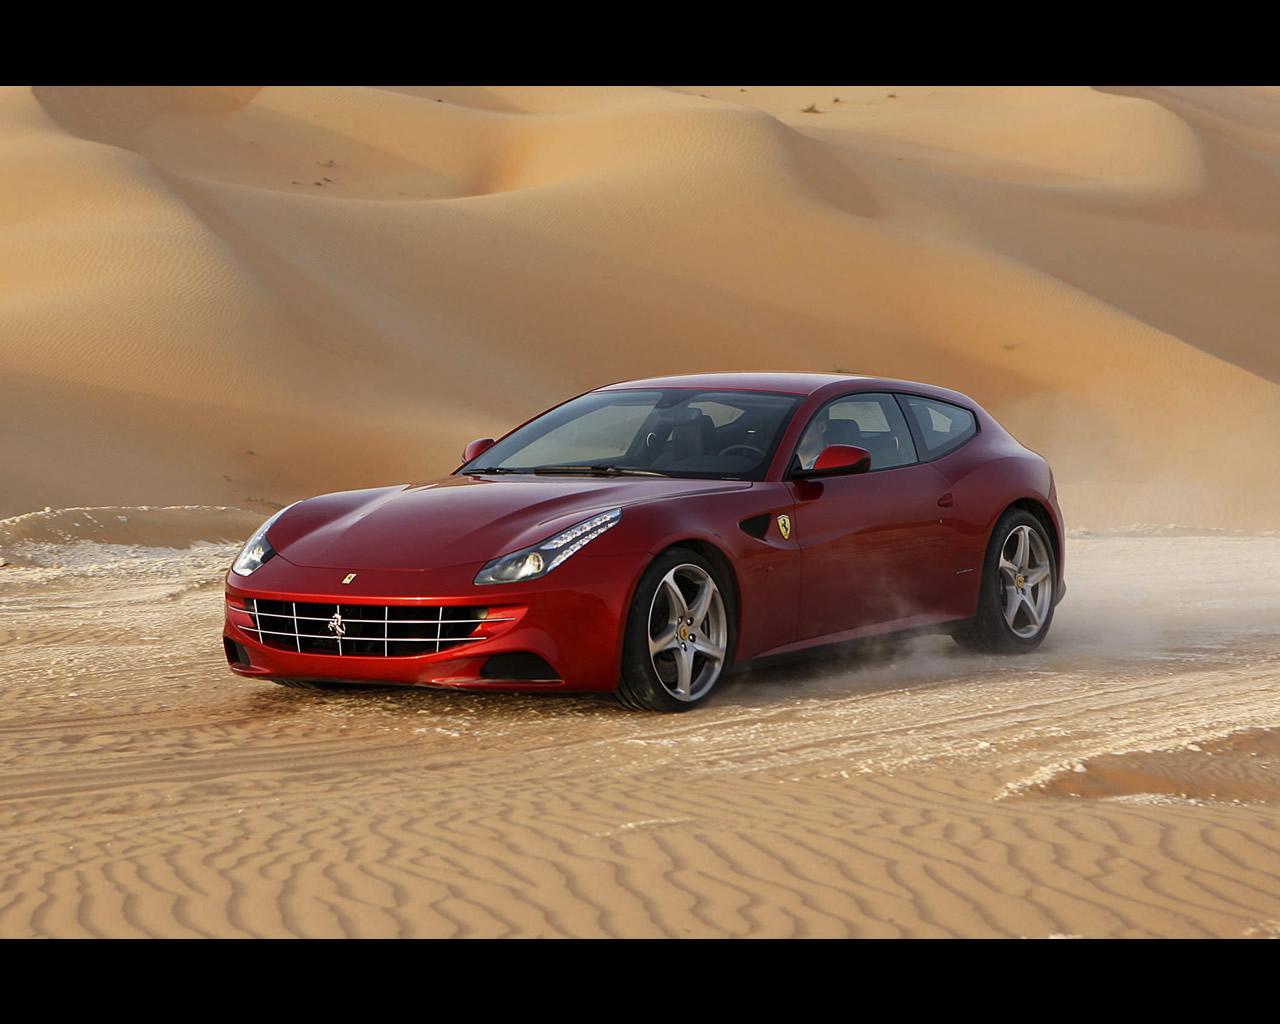 Ferrari Ff 2011 California Fuse Box